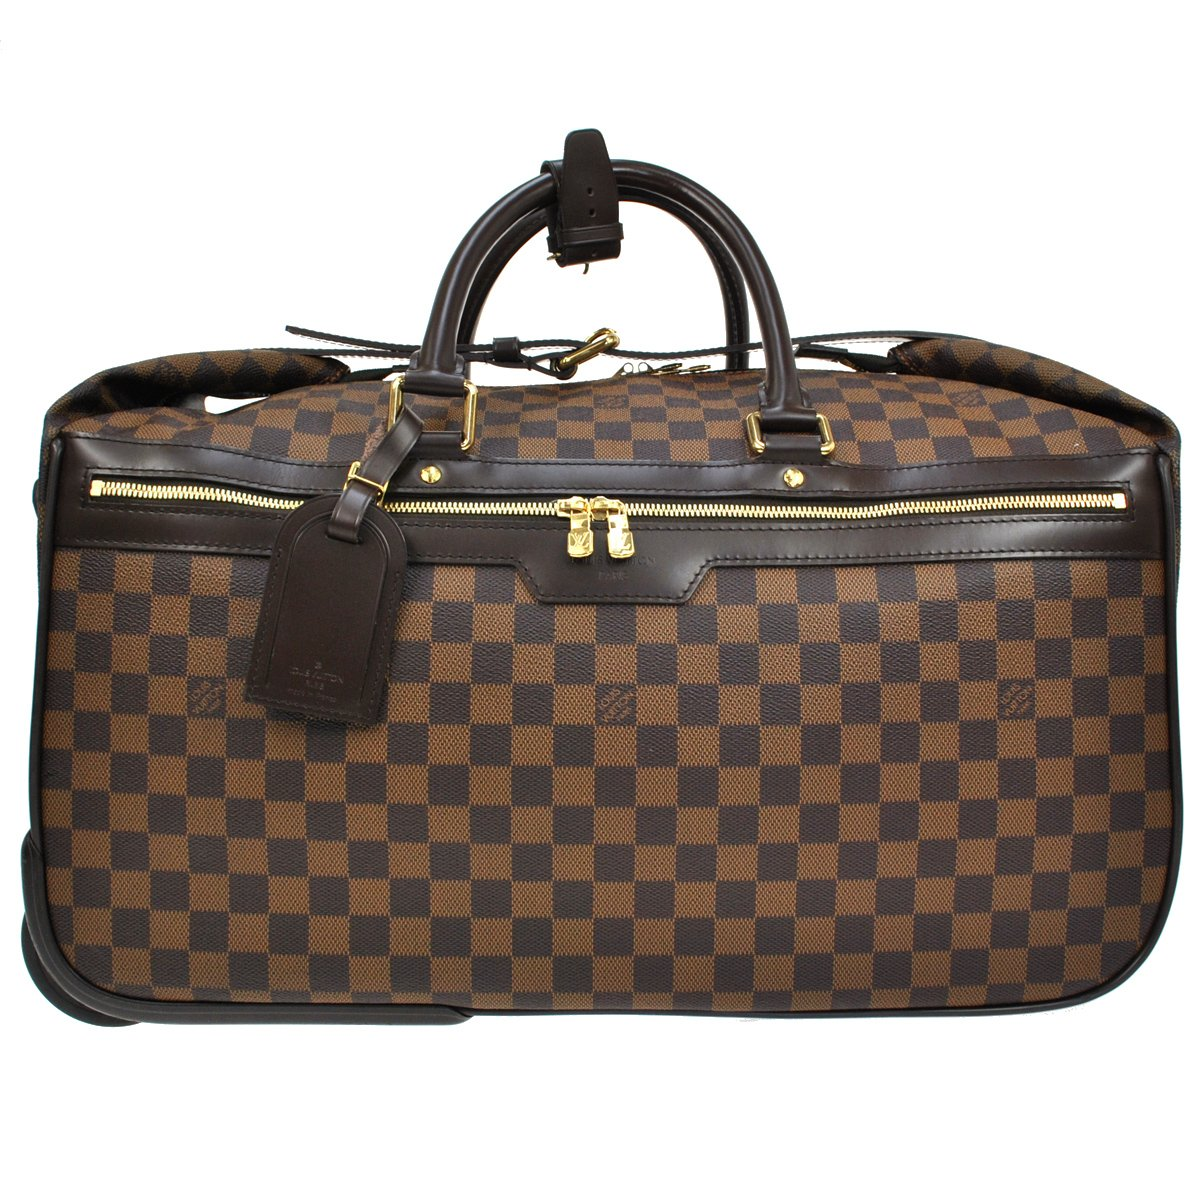 9e7571b6ad29 Home   Designer Brand   Louis Vuitton   Weekend Travel bag   Louis Vuitton  Damier Ebene Eole 50 Rolling Carry-on Suitcase Duffel